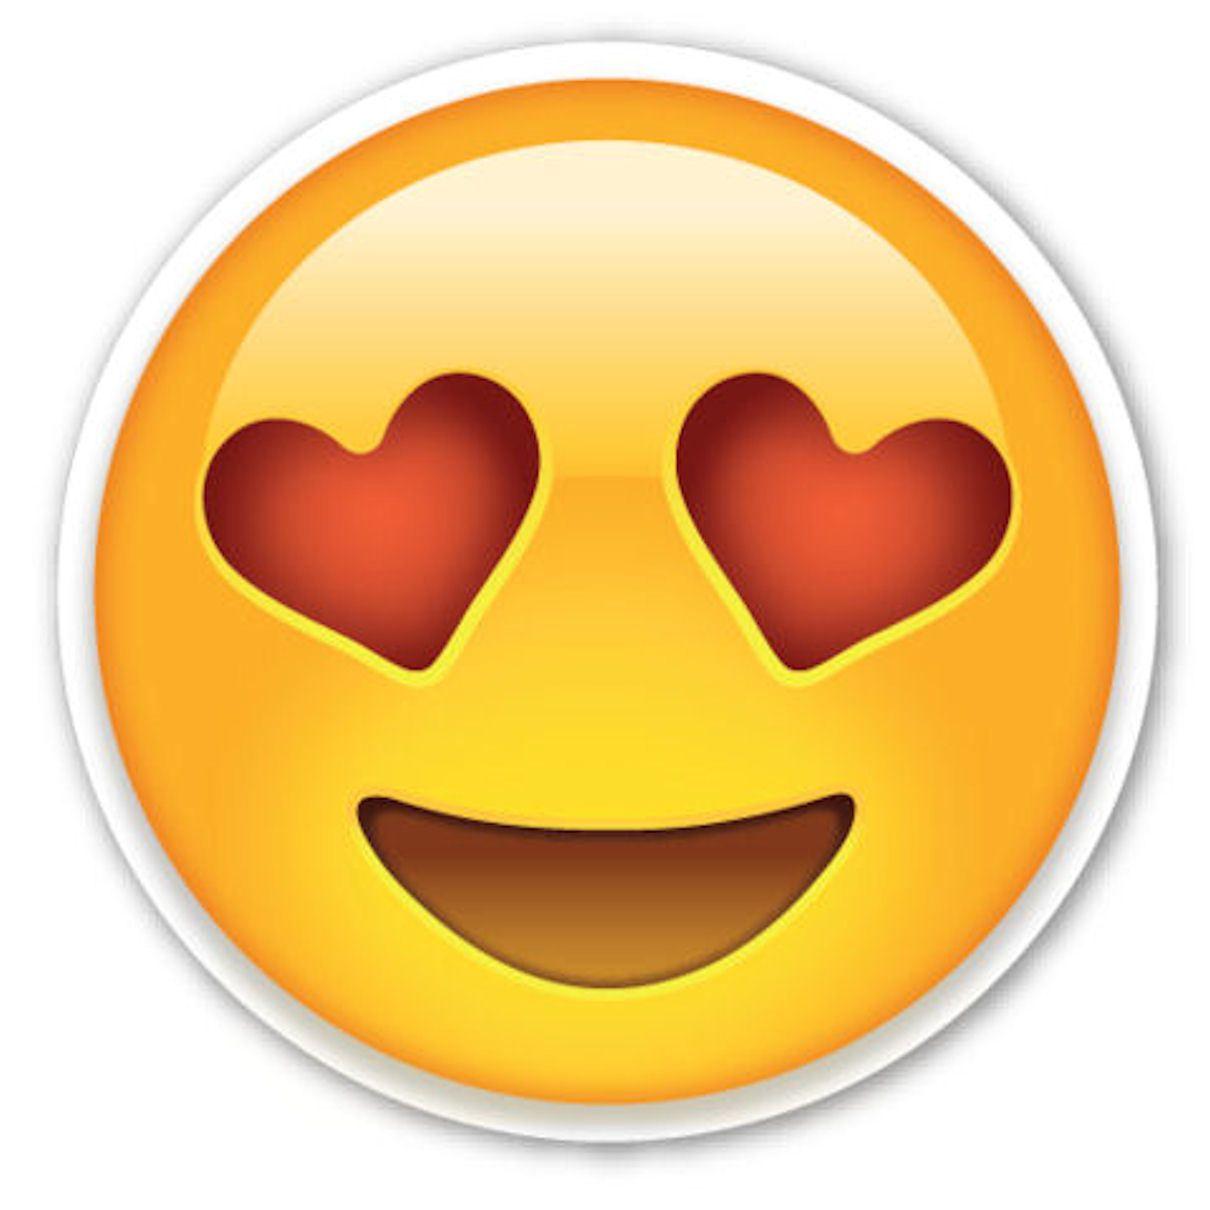 framed emoji print - love heart eyes face (picture poster emoticons